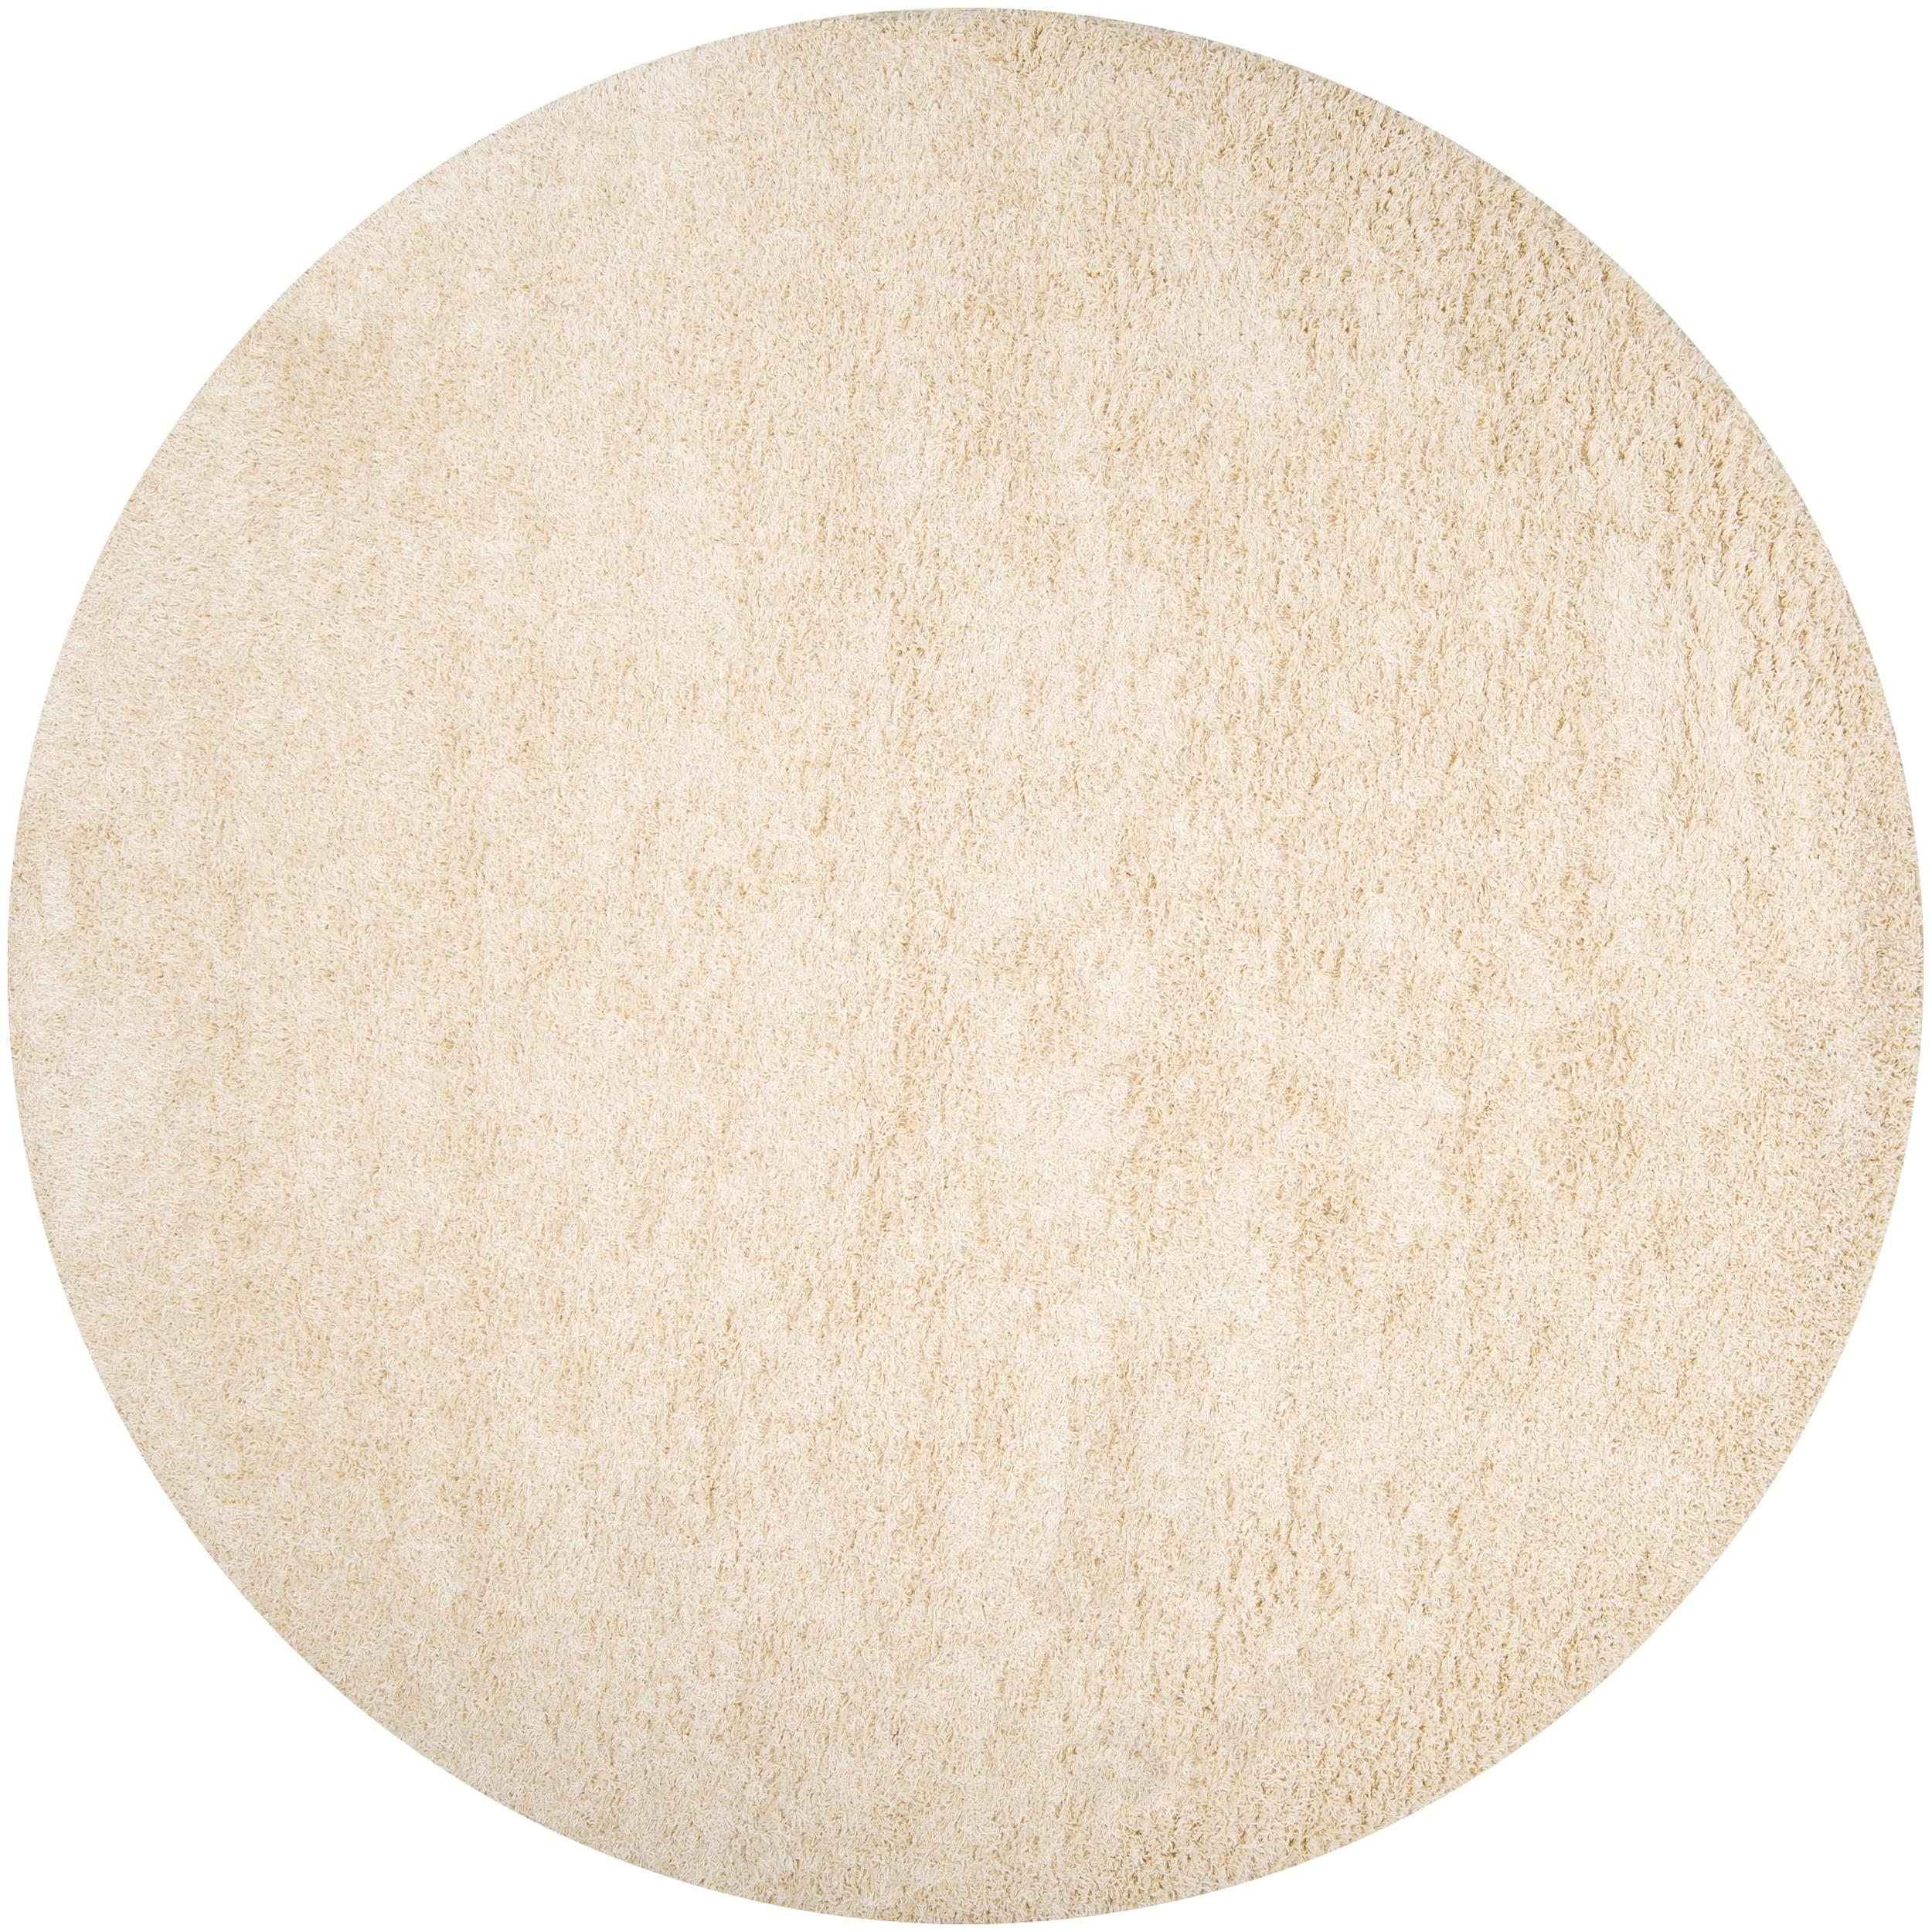 Woven Ivory Debacle Plush Shag (6' Round)